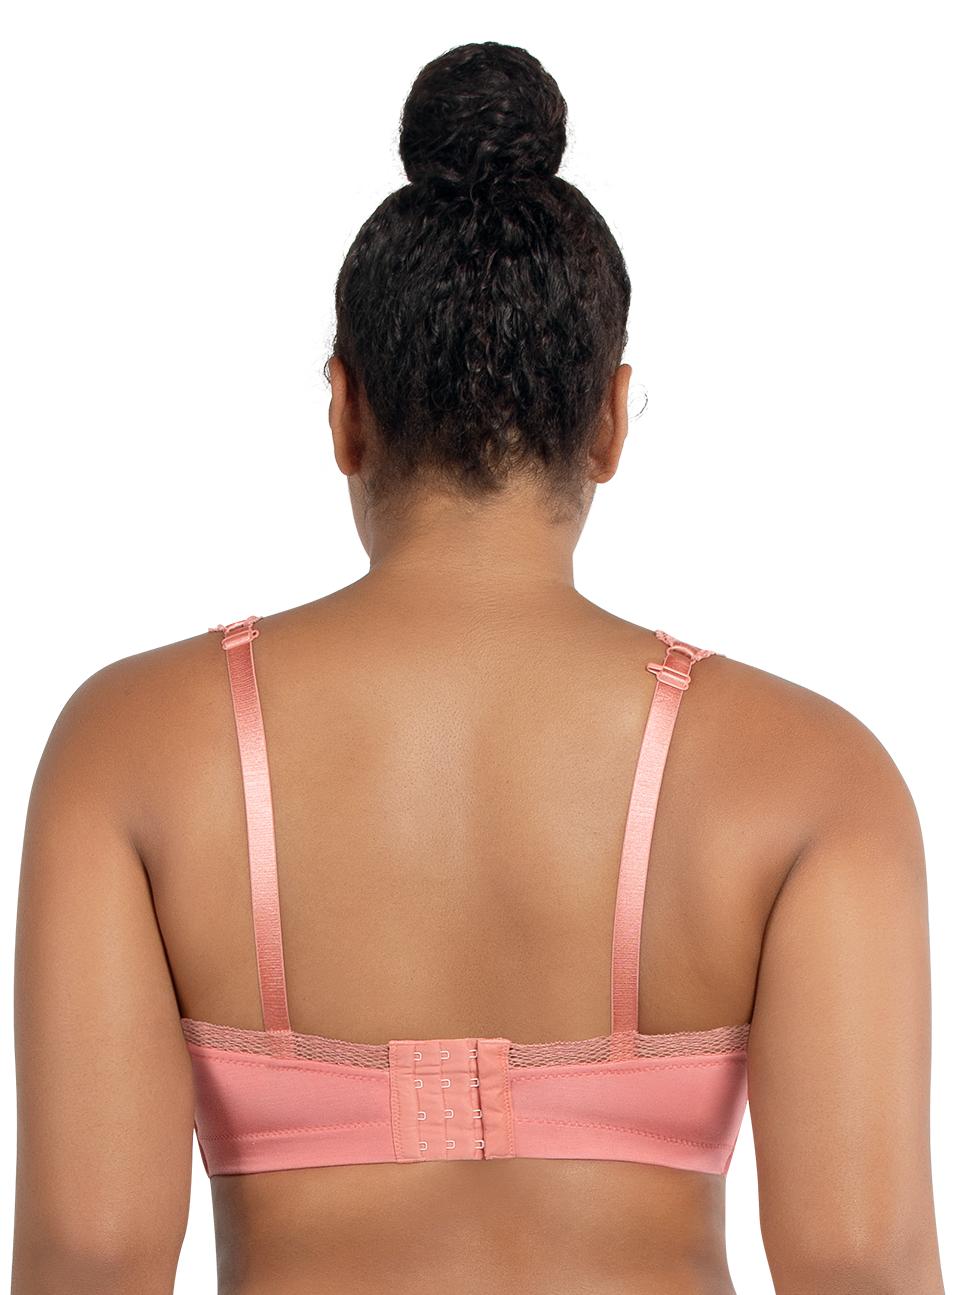 PARFAIT Dalis BraletteP5641 PinkBlush Back - Dalis Bralette Pink Blush P5641